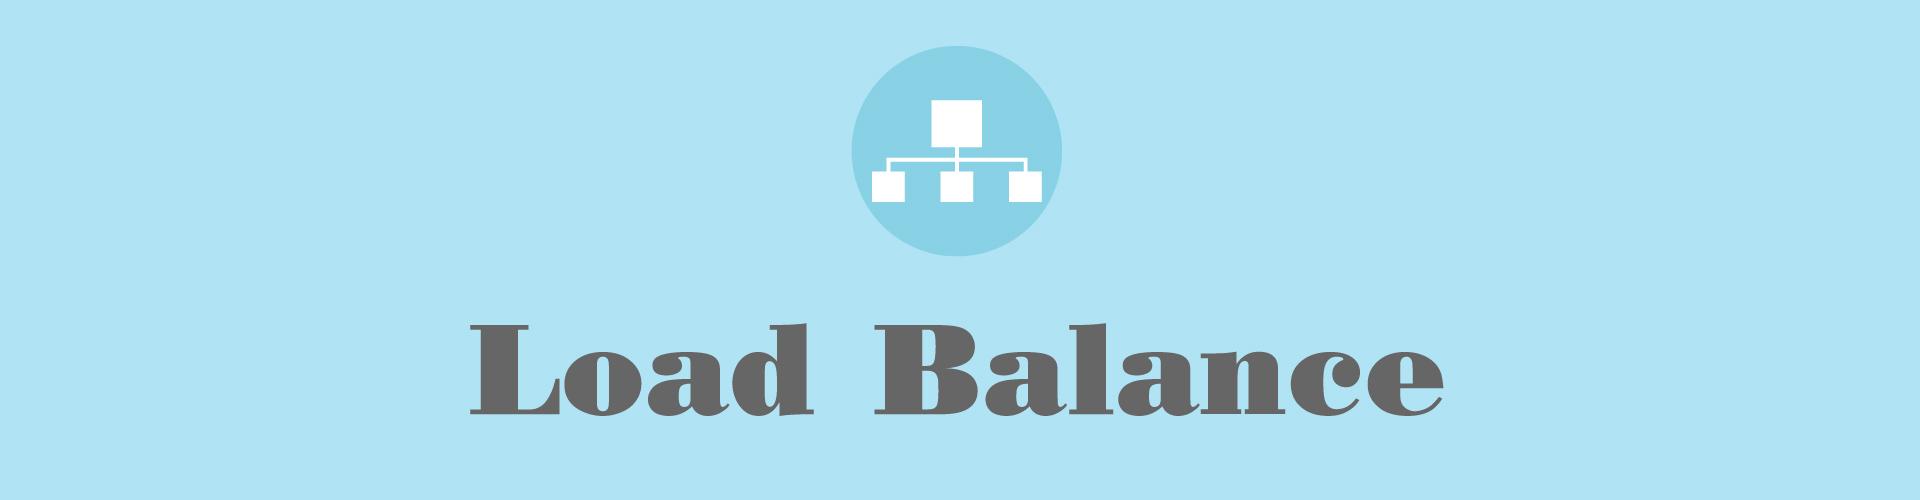 Load-Balance.1